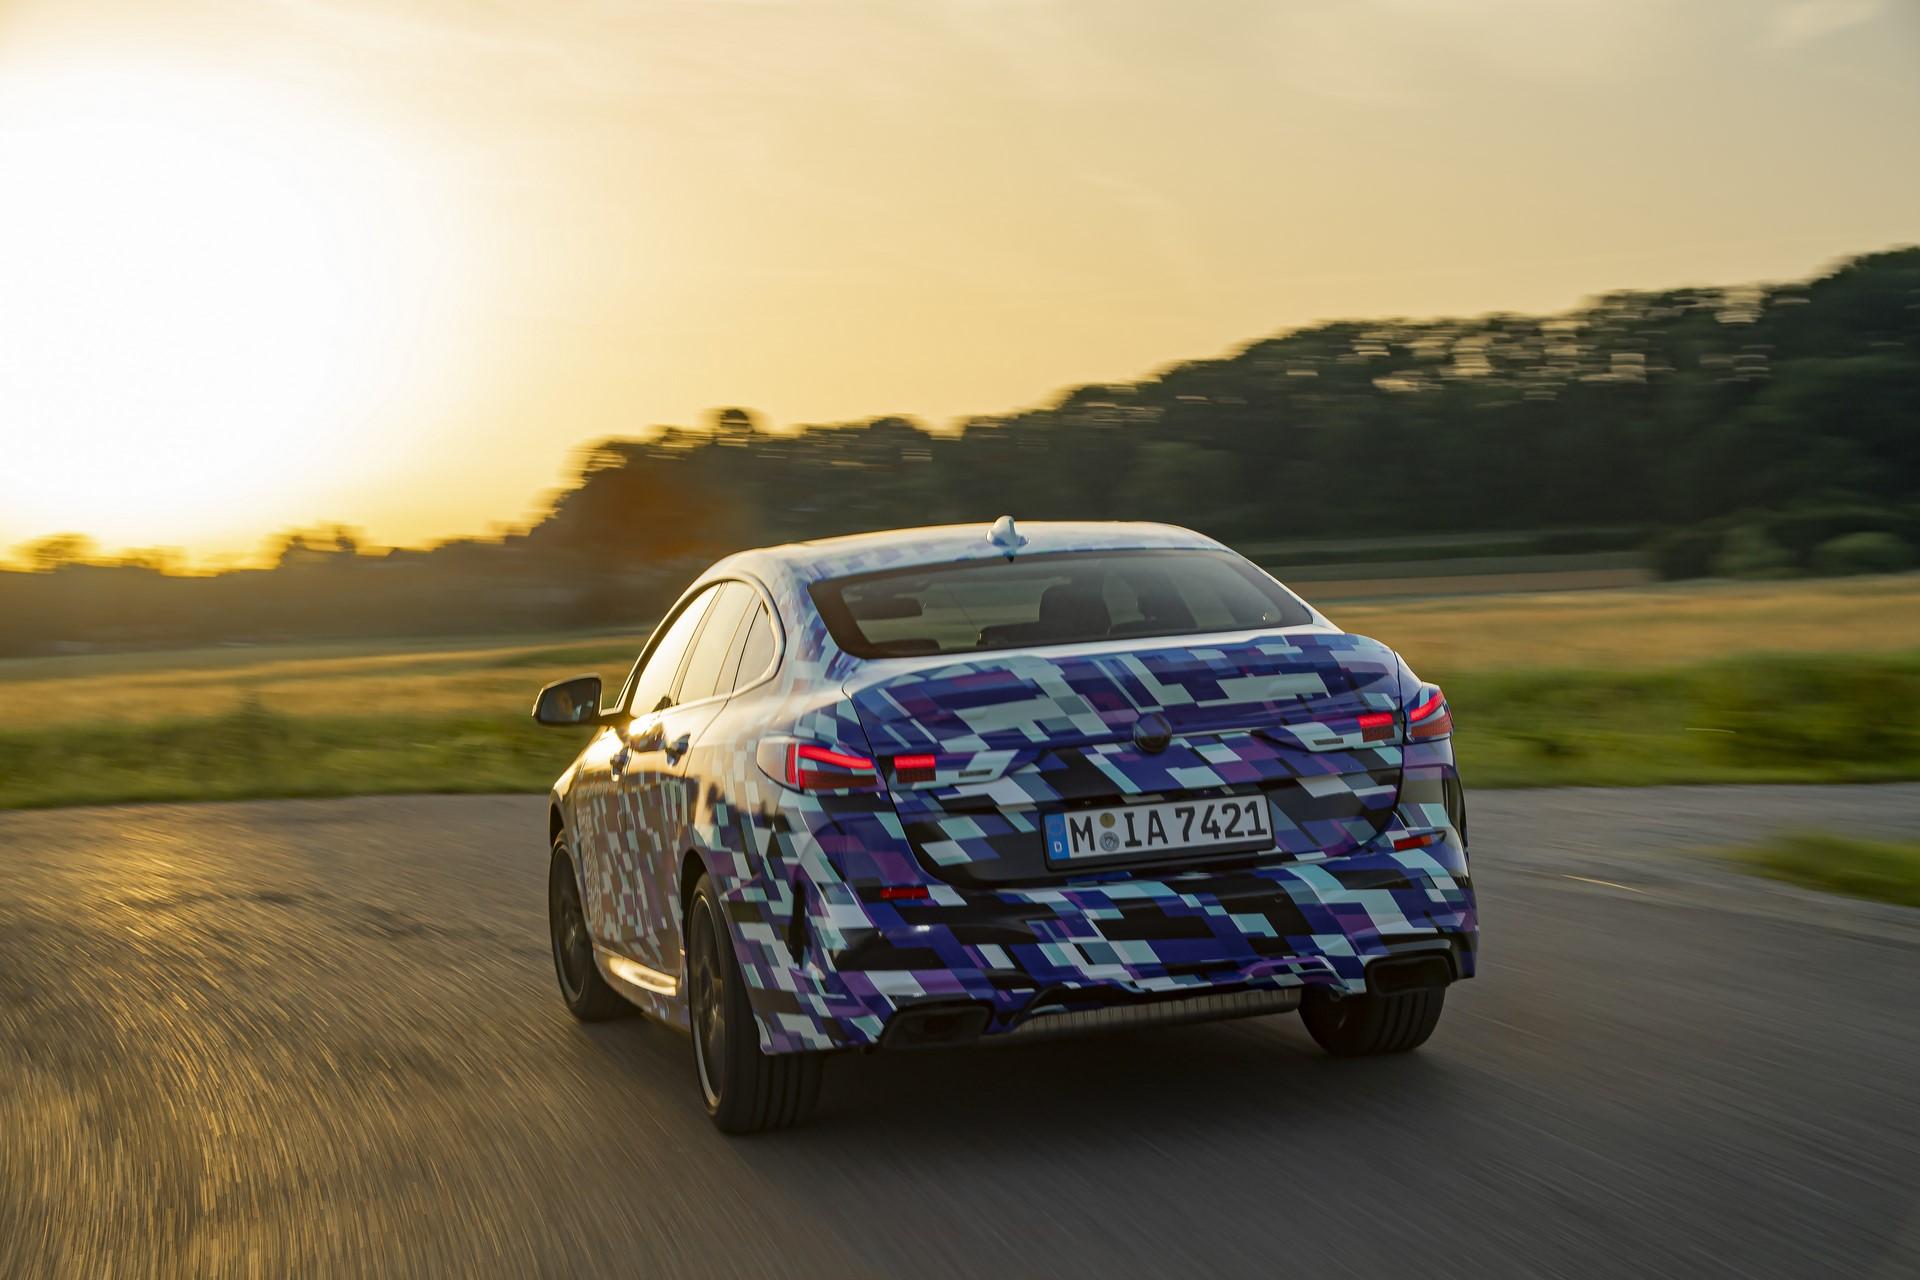 BMW-2-Series-Gran-Coupe-2020-spy-photos-36